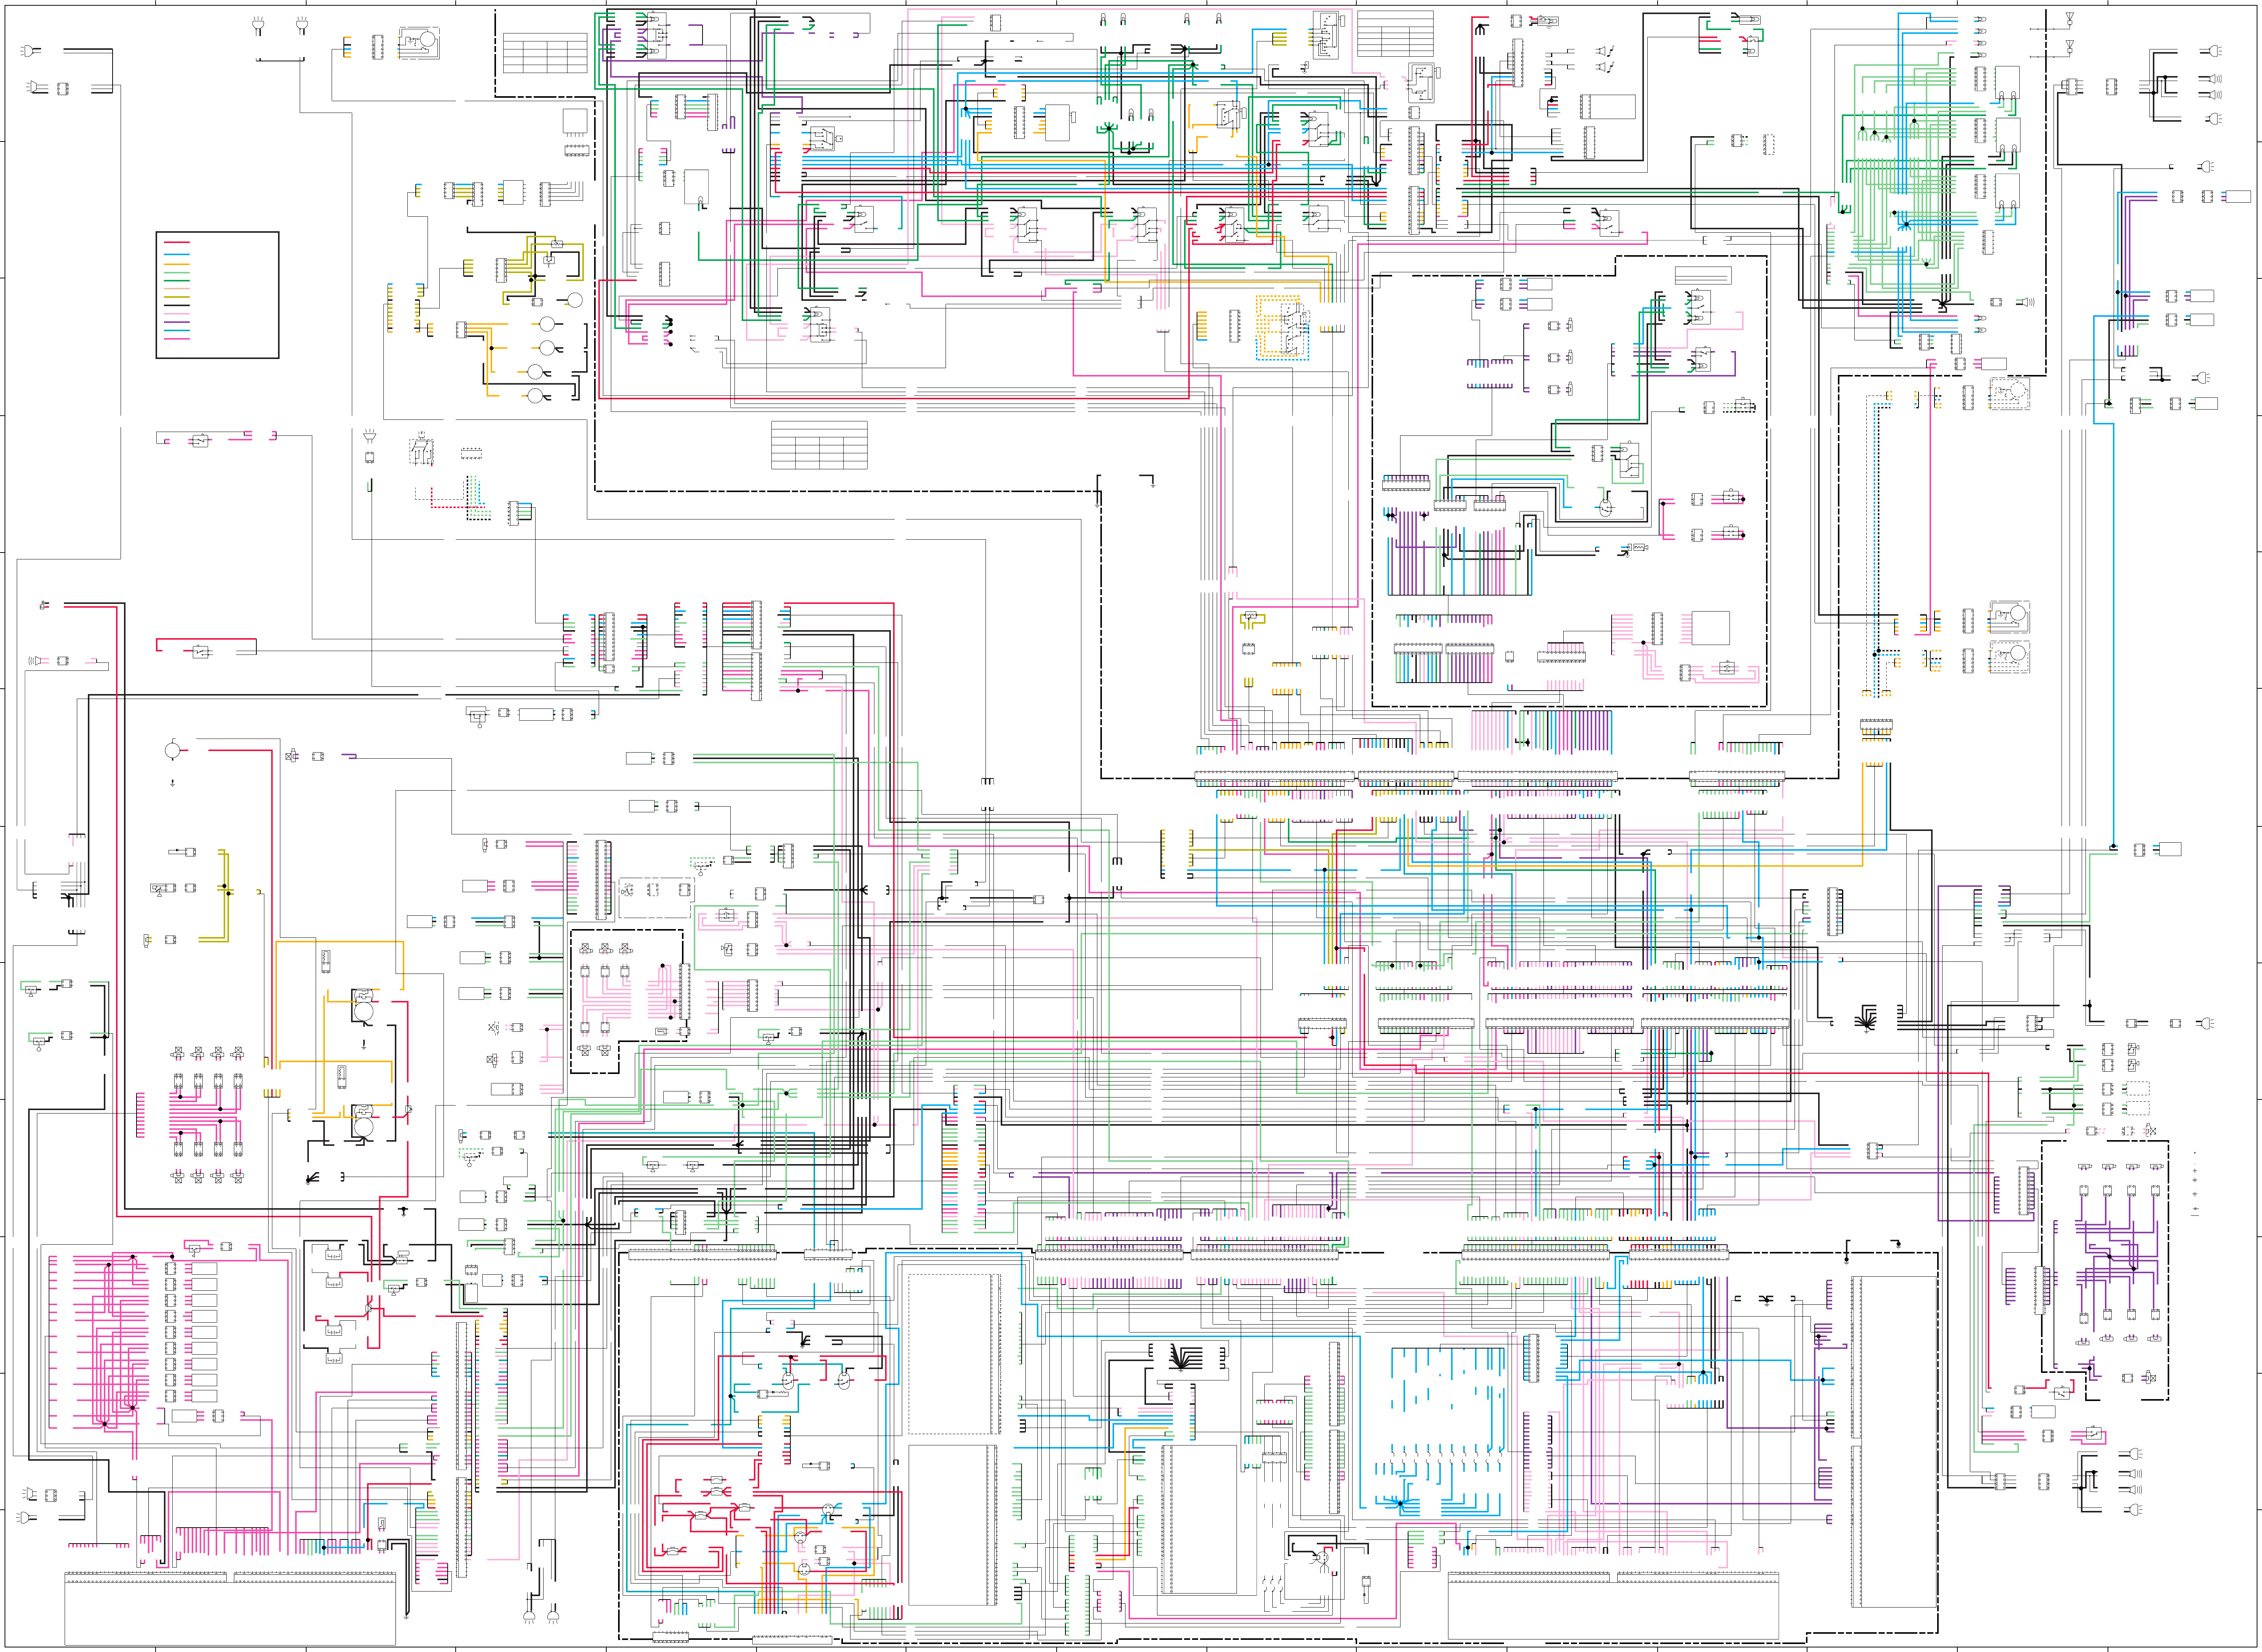 Wiring Diagram Map Sensor Wiring Diagram Cat 3126 Ecm Wiring Diagram